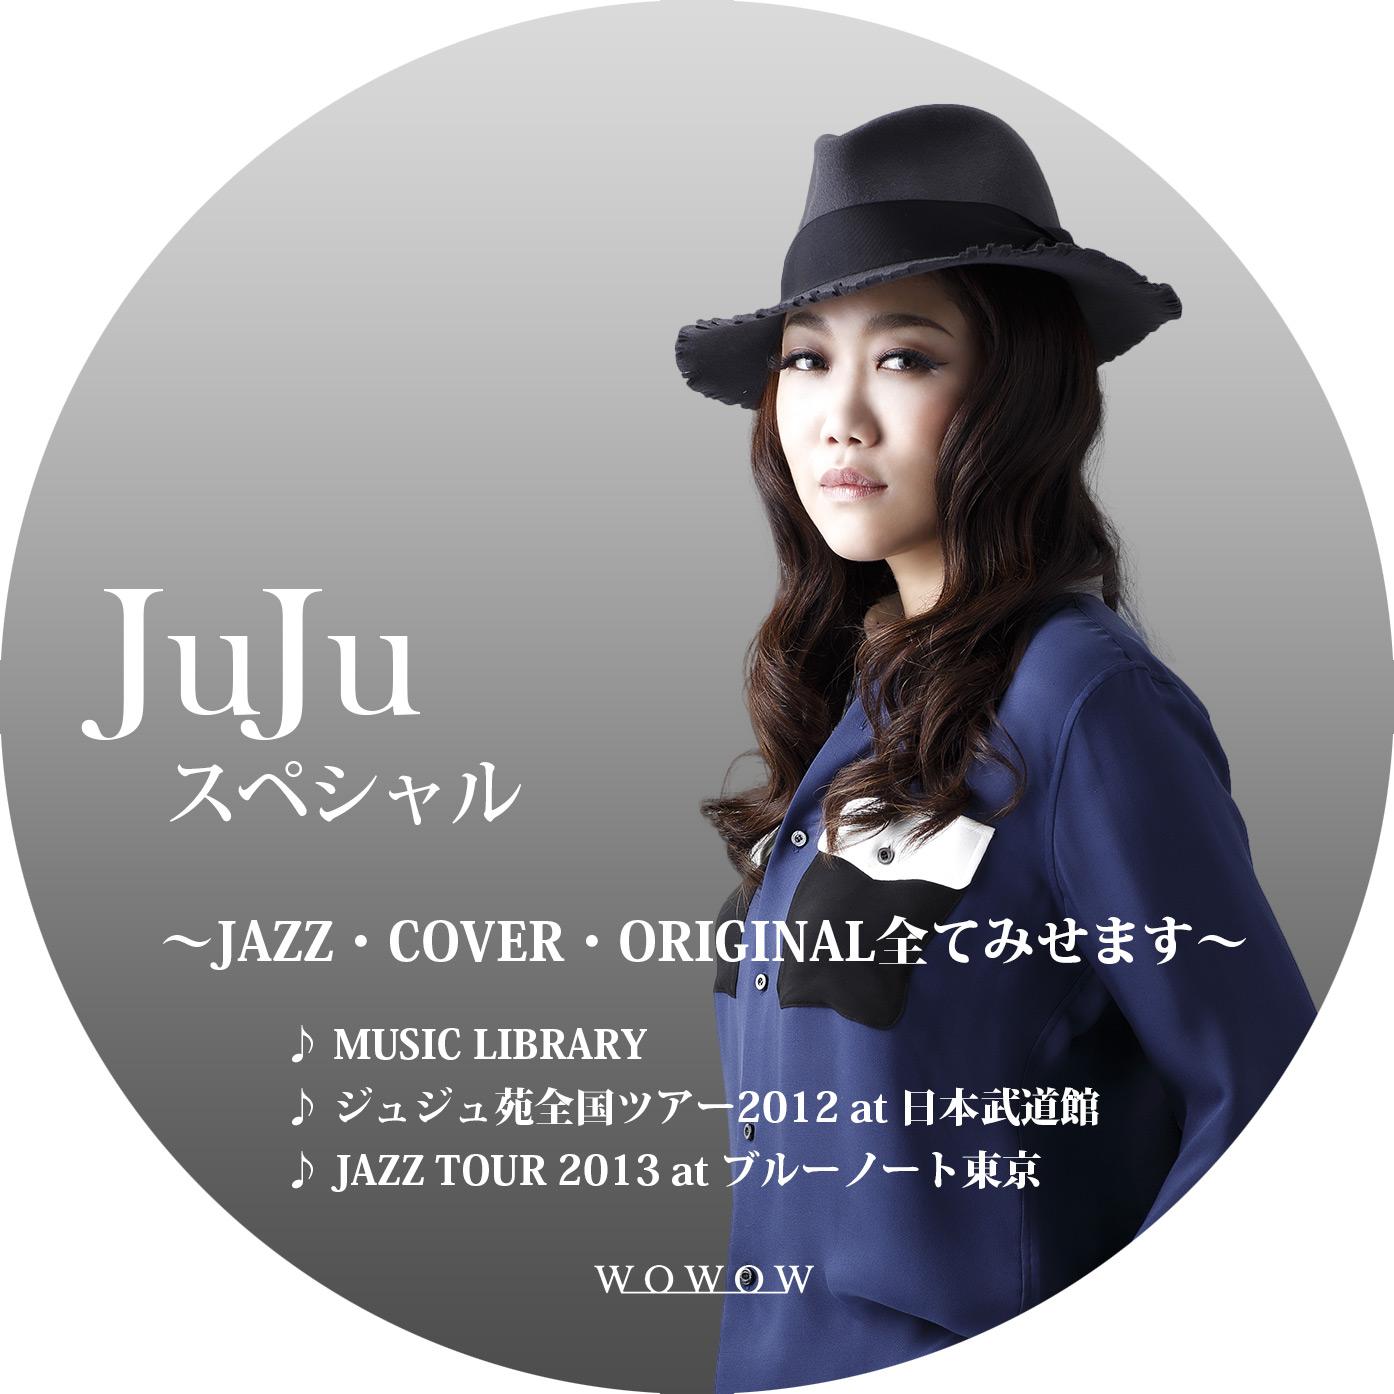 WOWOW JUJUスペシャル DVDラベル